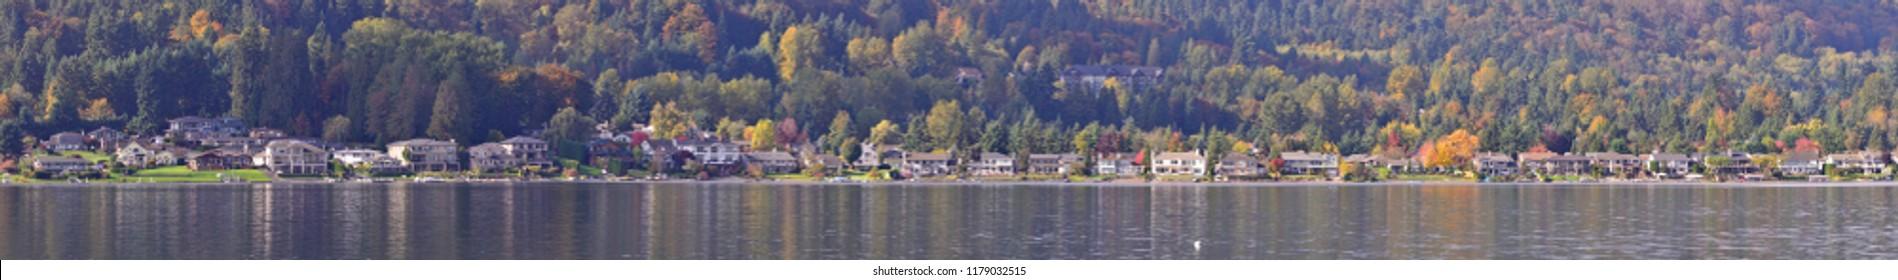 Panoramic View of Waterfront Homes in Lake Sammamish State Park, WA-USA